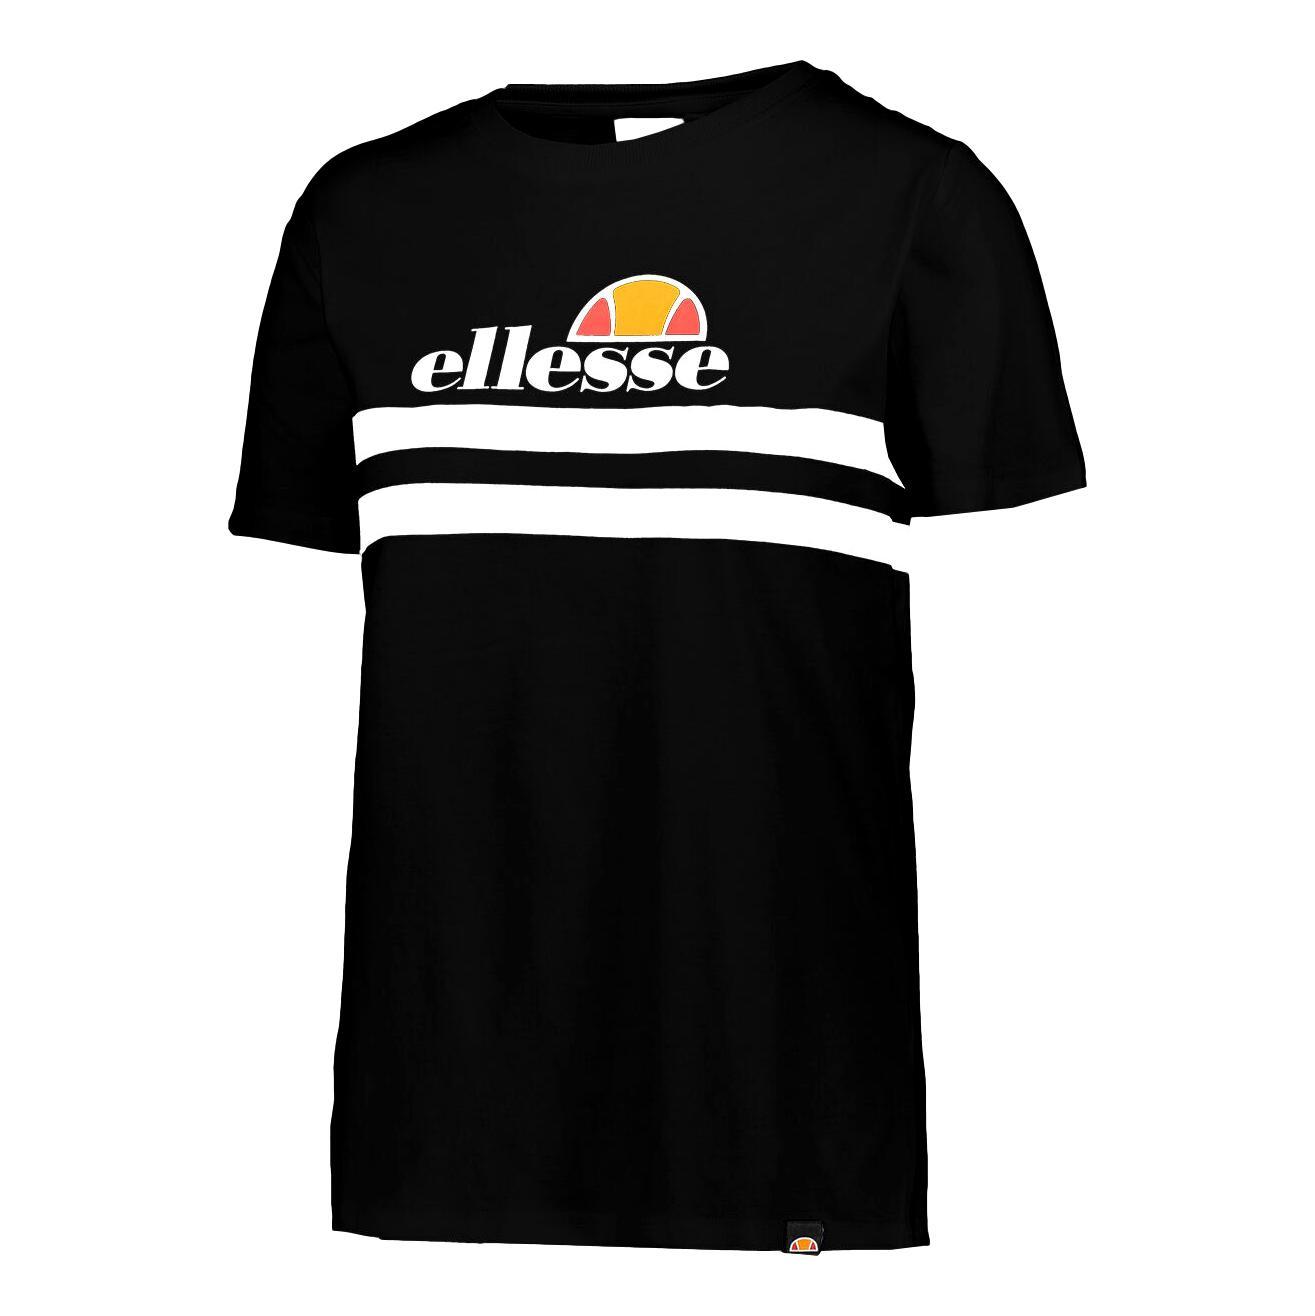 ellesse t-shirt ELLESSE |  | EHW213S21050